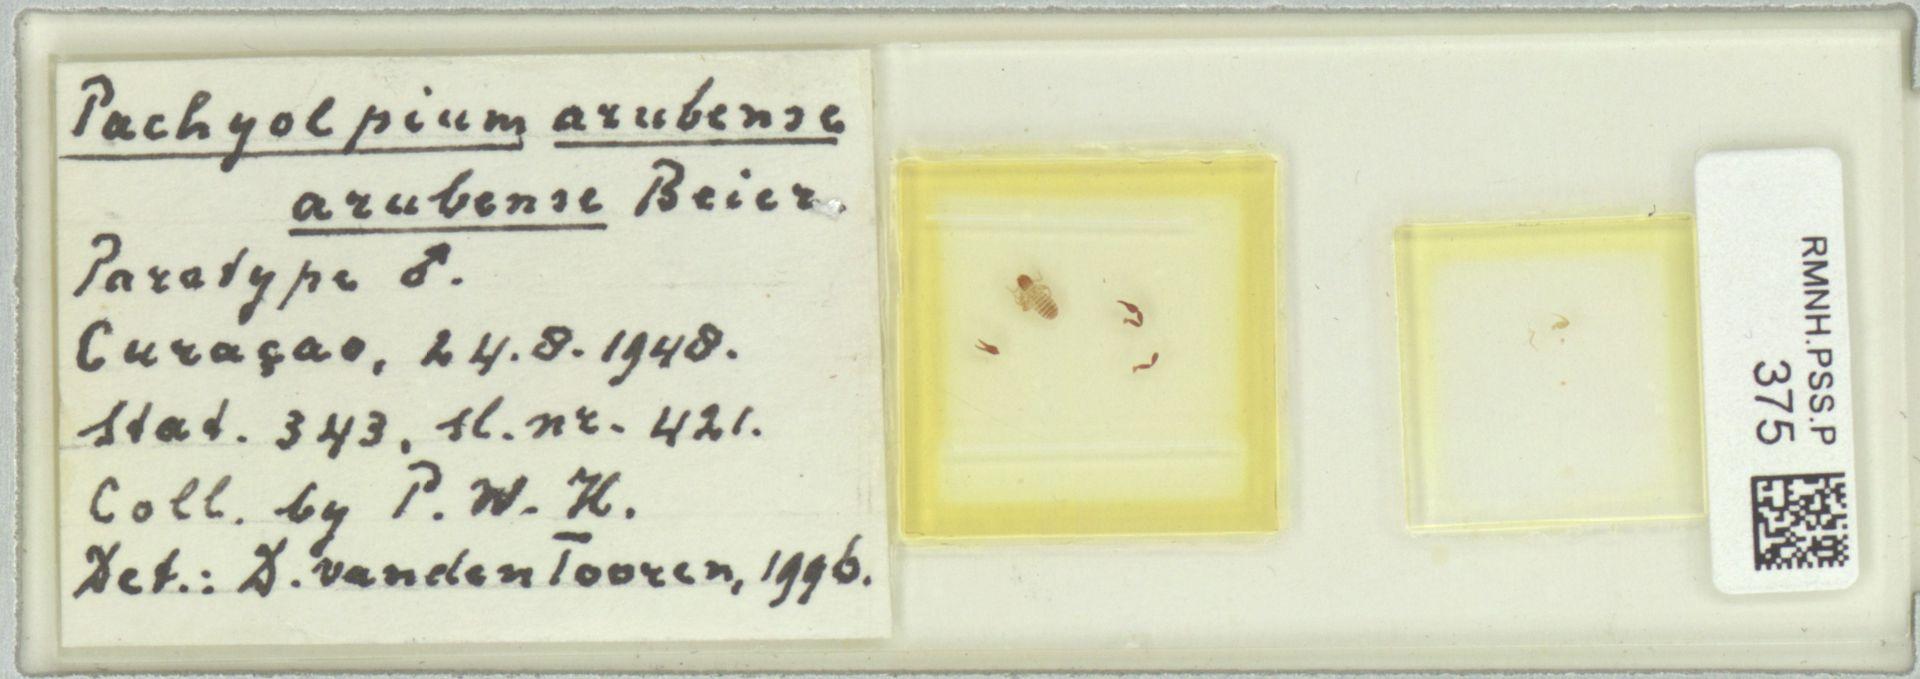 RMNH.PSS.P.375 | Pachyolpium arubense arubense